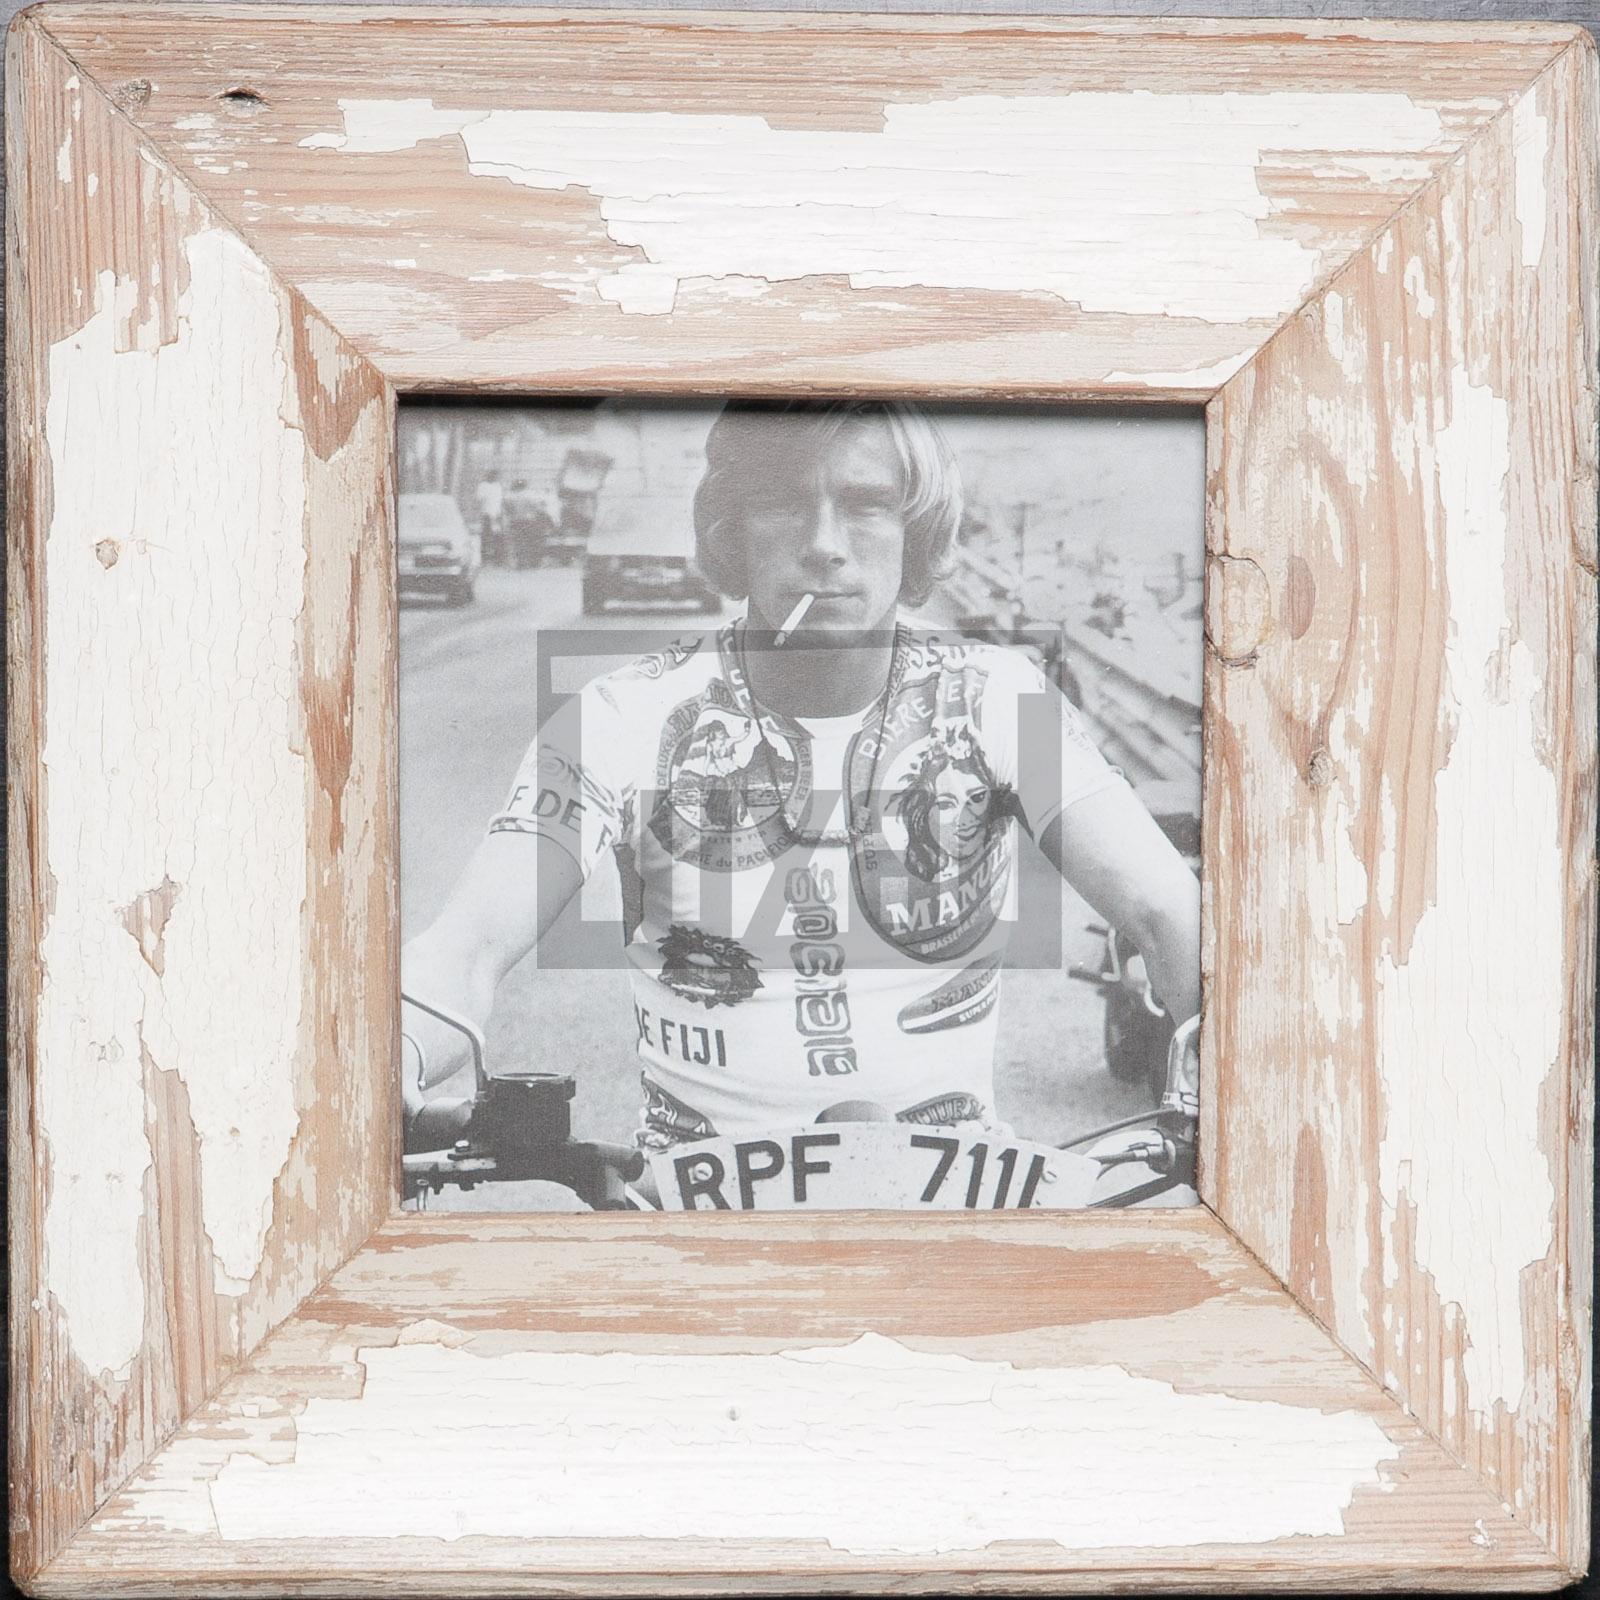 Quadratischer Vintage-Bilderrahmen für quadratische Fotos